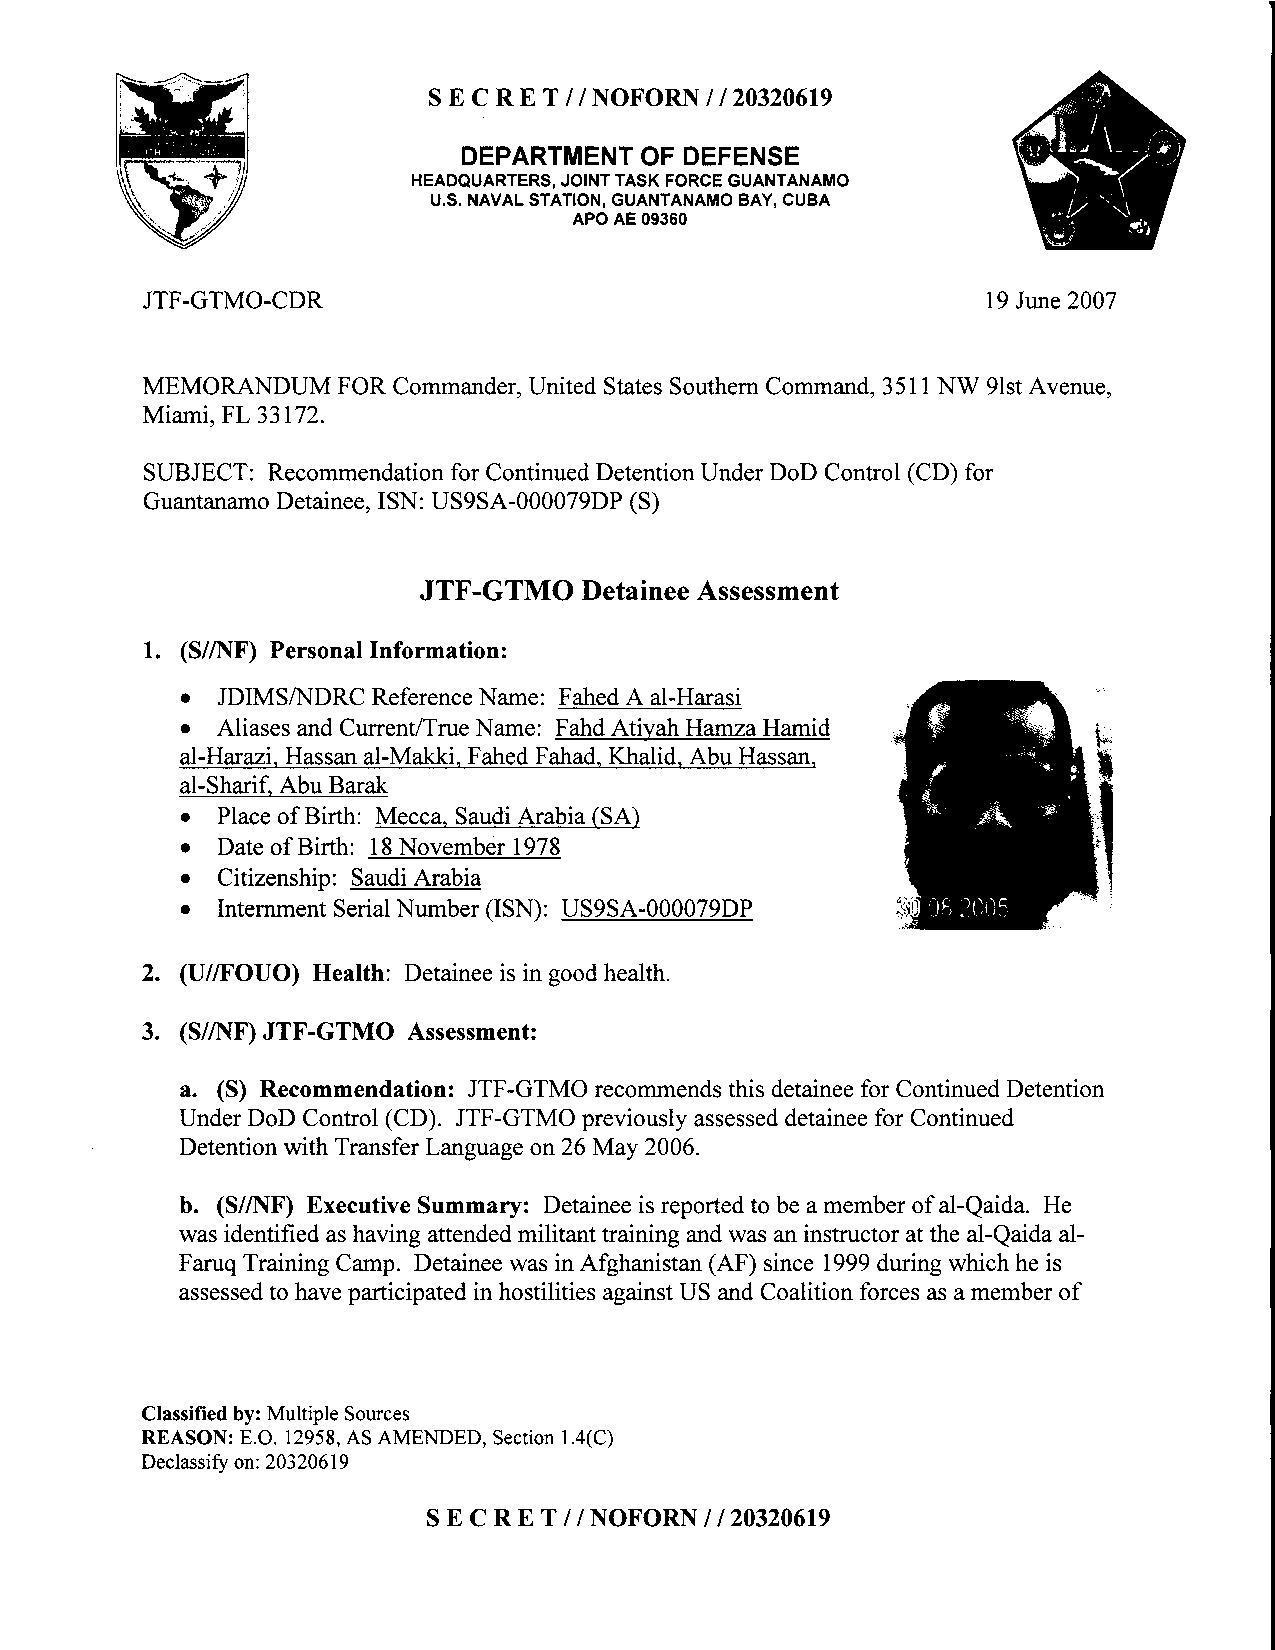 ISN 00079, Fahed A al-Harasi's Guantanamo detainee assessment.pdf